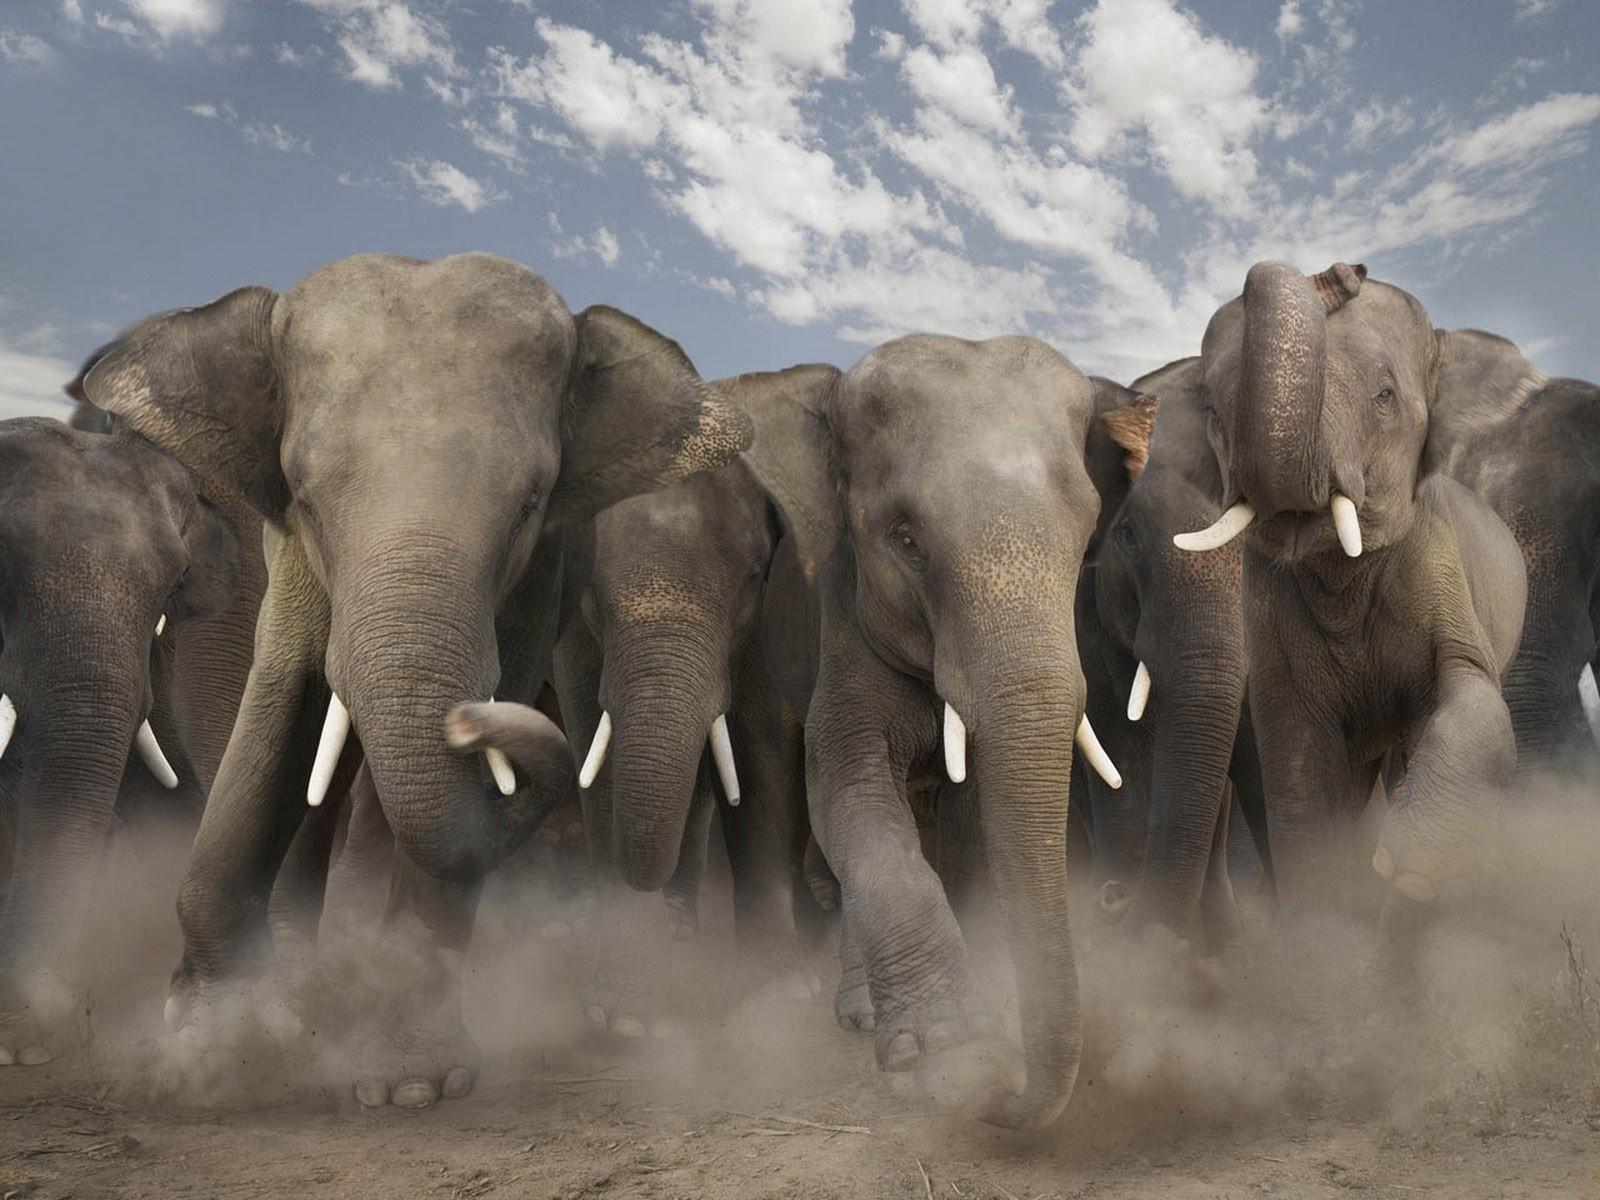 Hd Images Of The Wild Animals Wallpapers And Backgrounds: Fondos De Pantalla De Elefantes, Wallpapers HD Para